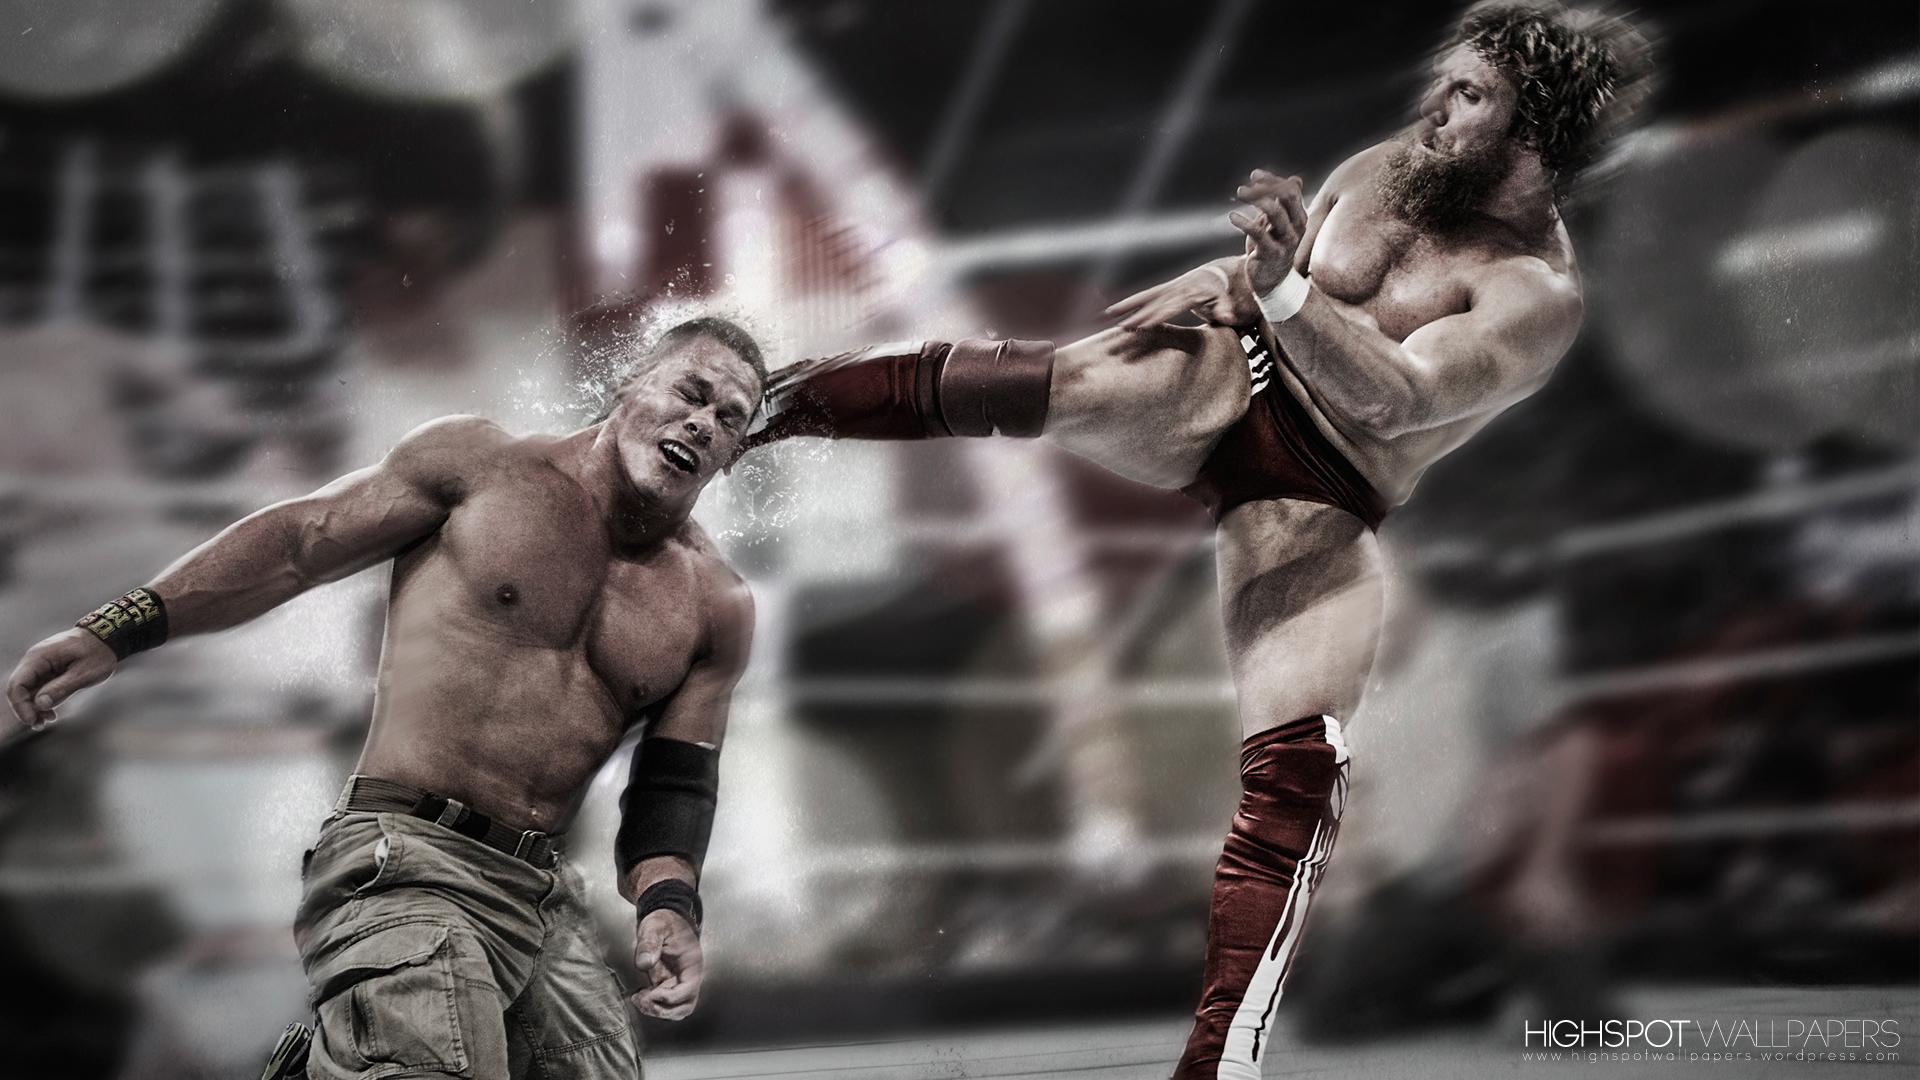 Daniel Bryan Lights Out Series Wallpaper | Highspot Wrestling ... Daniel Bryan Iphone Wallpaper